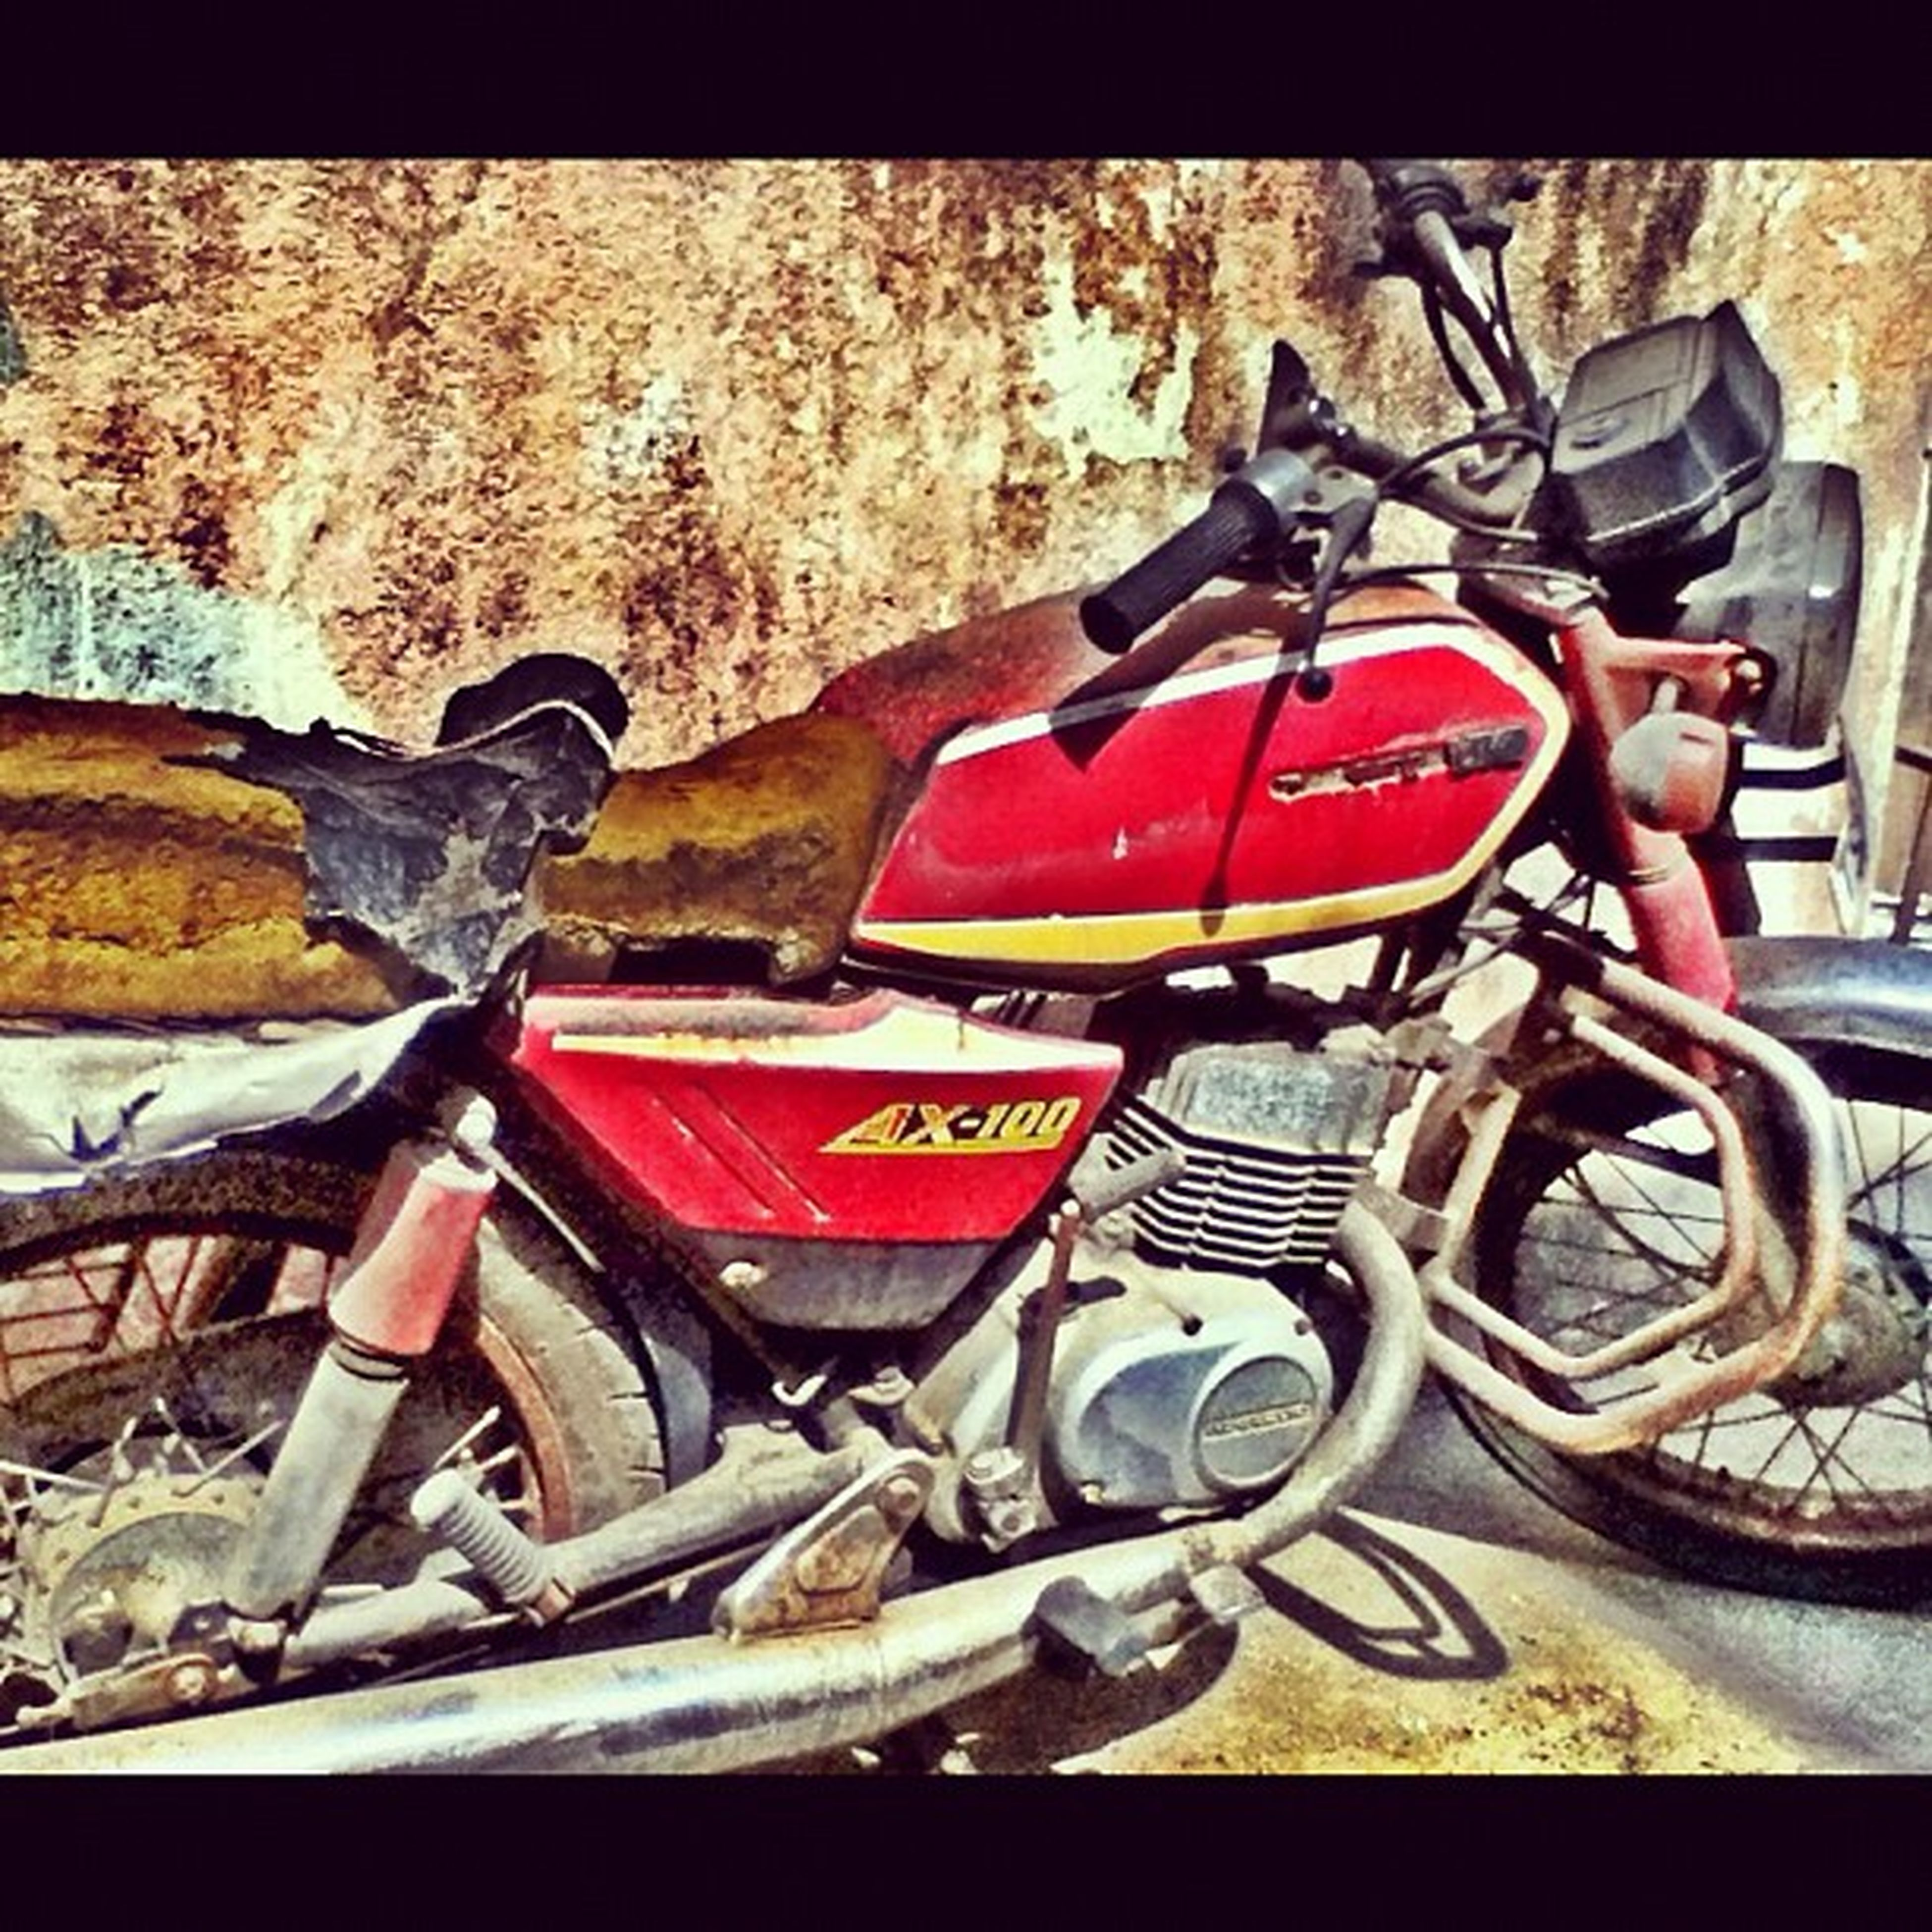 An old abandoned Bike ...